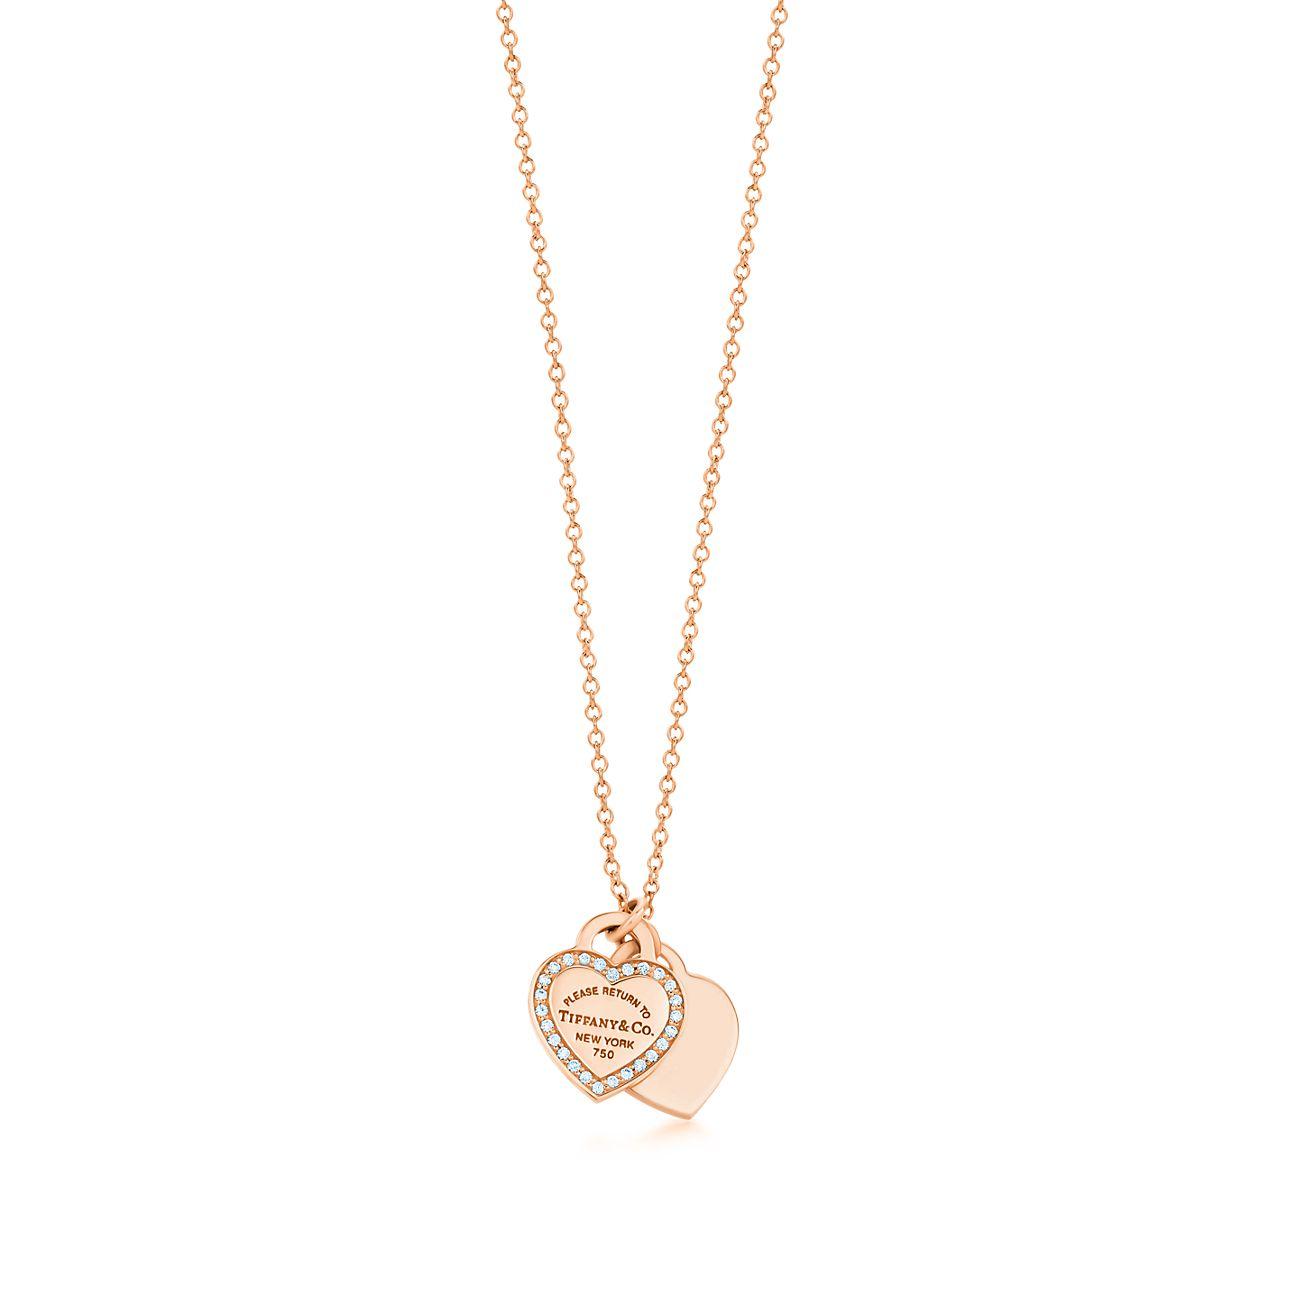 7a4f3870b73eb Tiffany Co Return To Mini Double Heart Tag Pendant Necklace ...